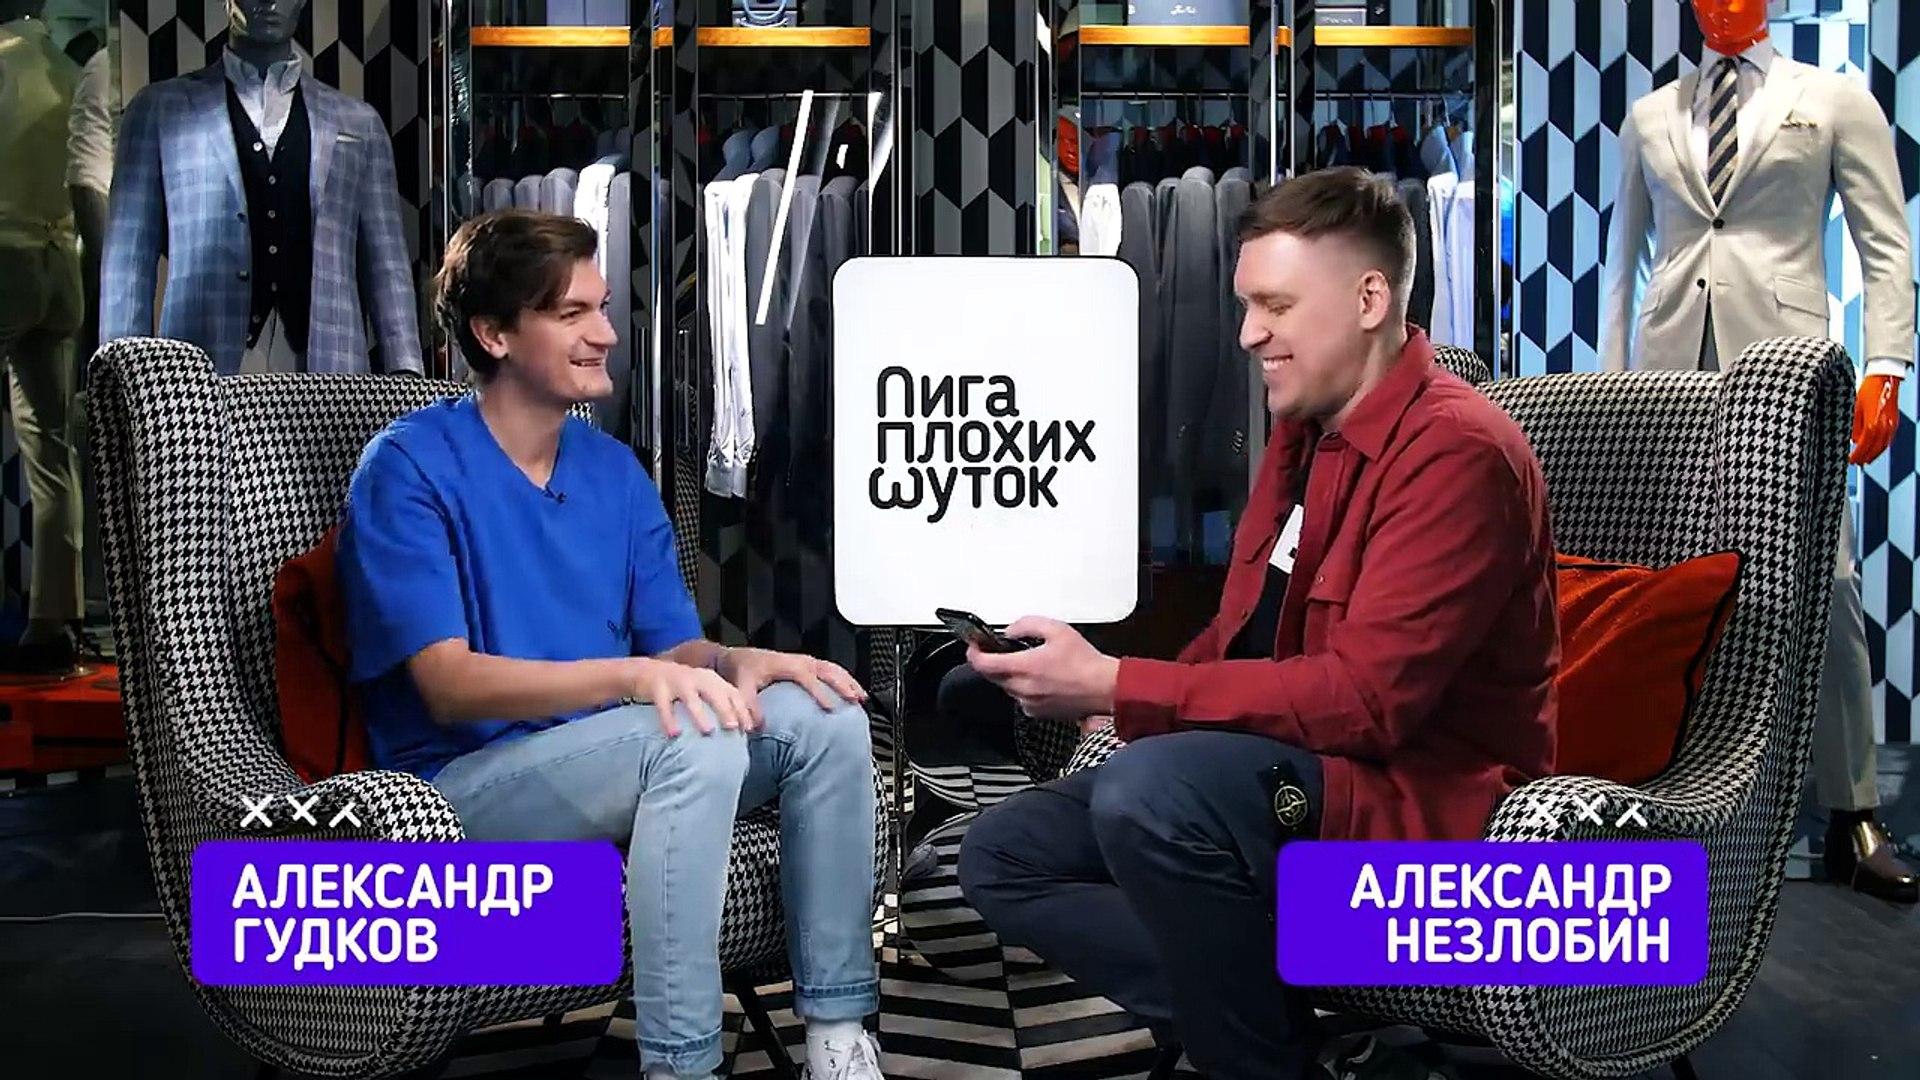 ЛИГА ПЛОХИХ ШУТОК #8 | Александр Гудков х Александр Незл